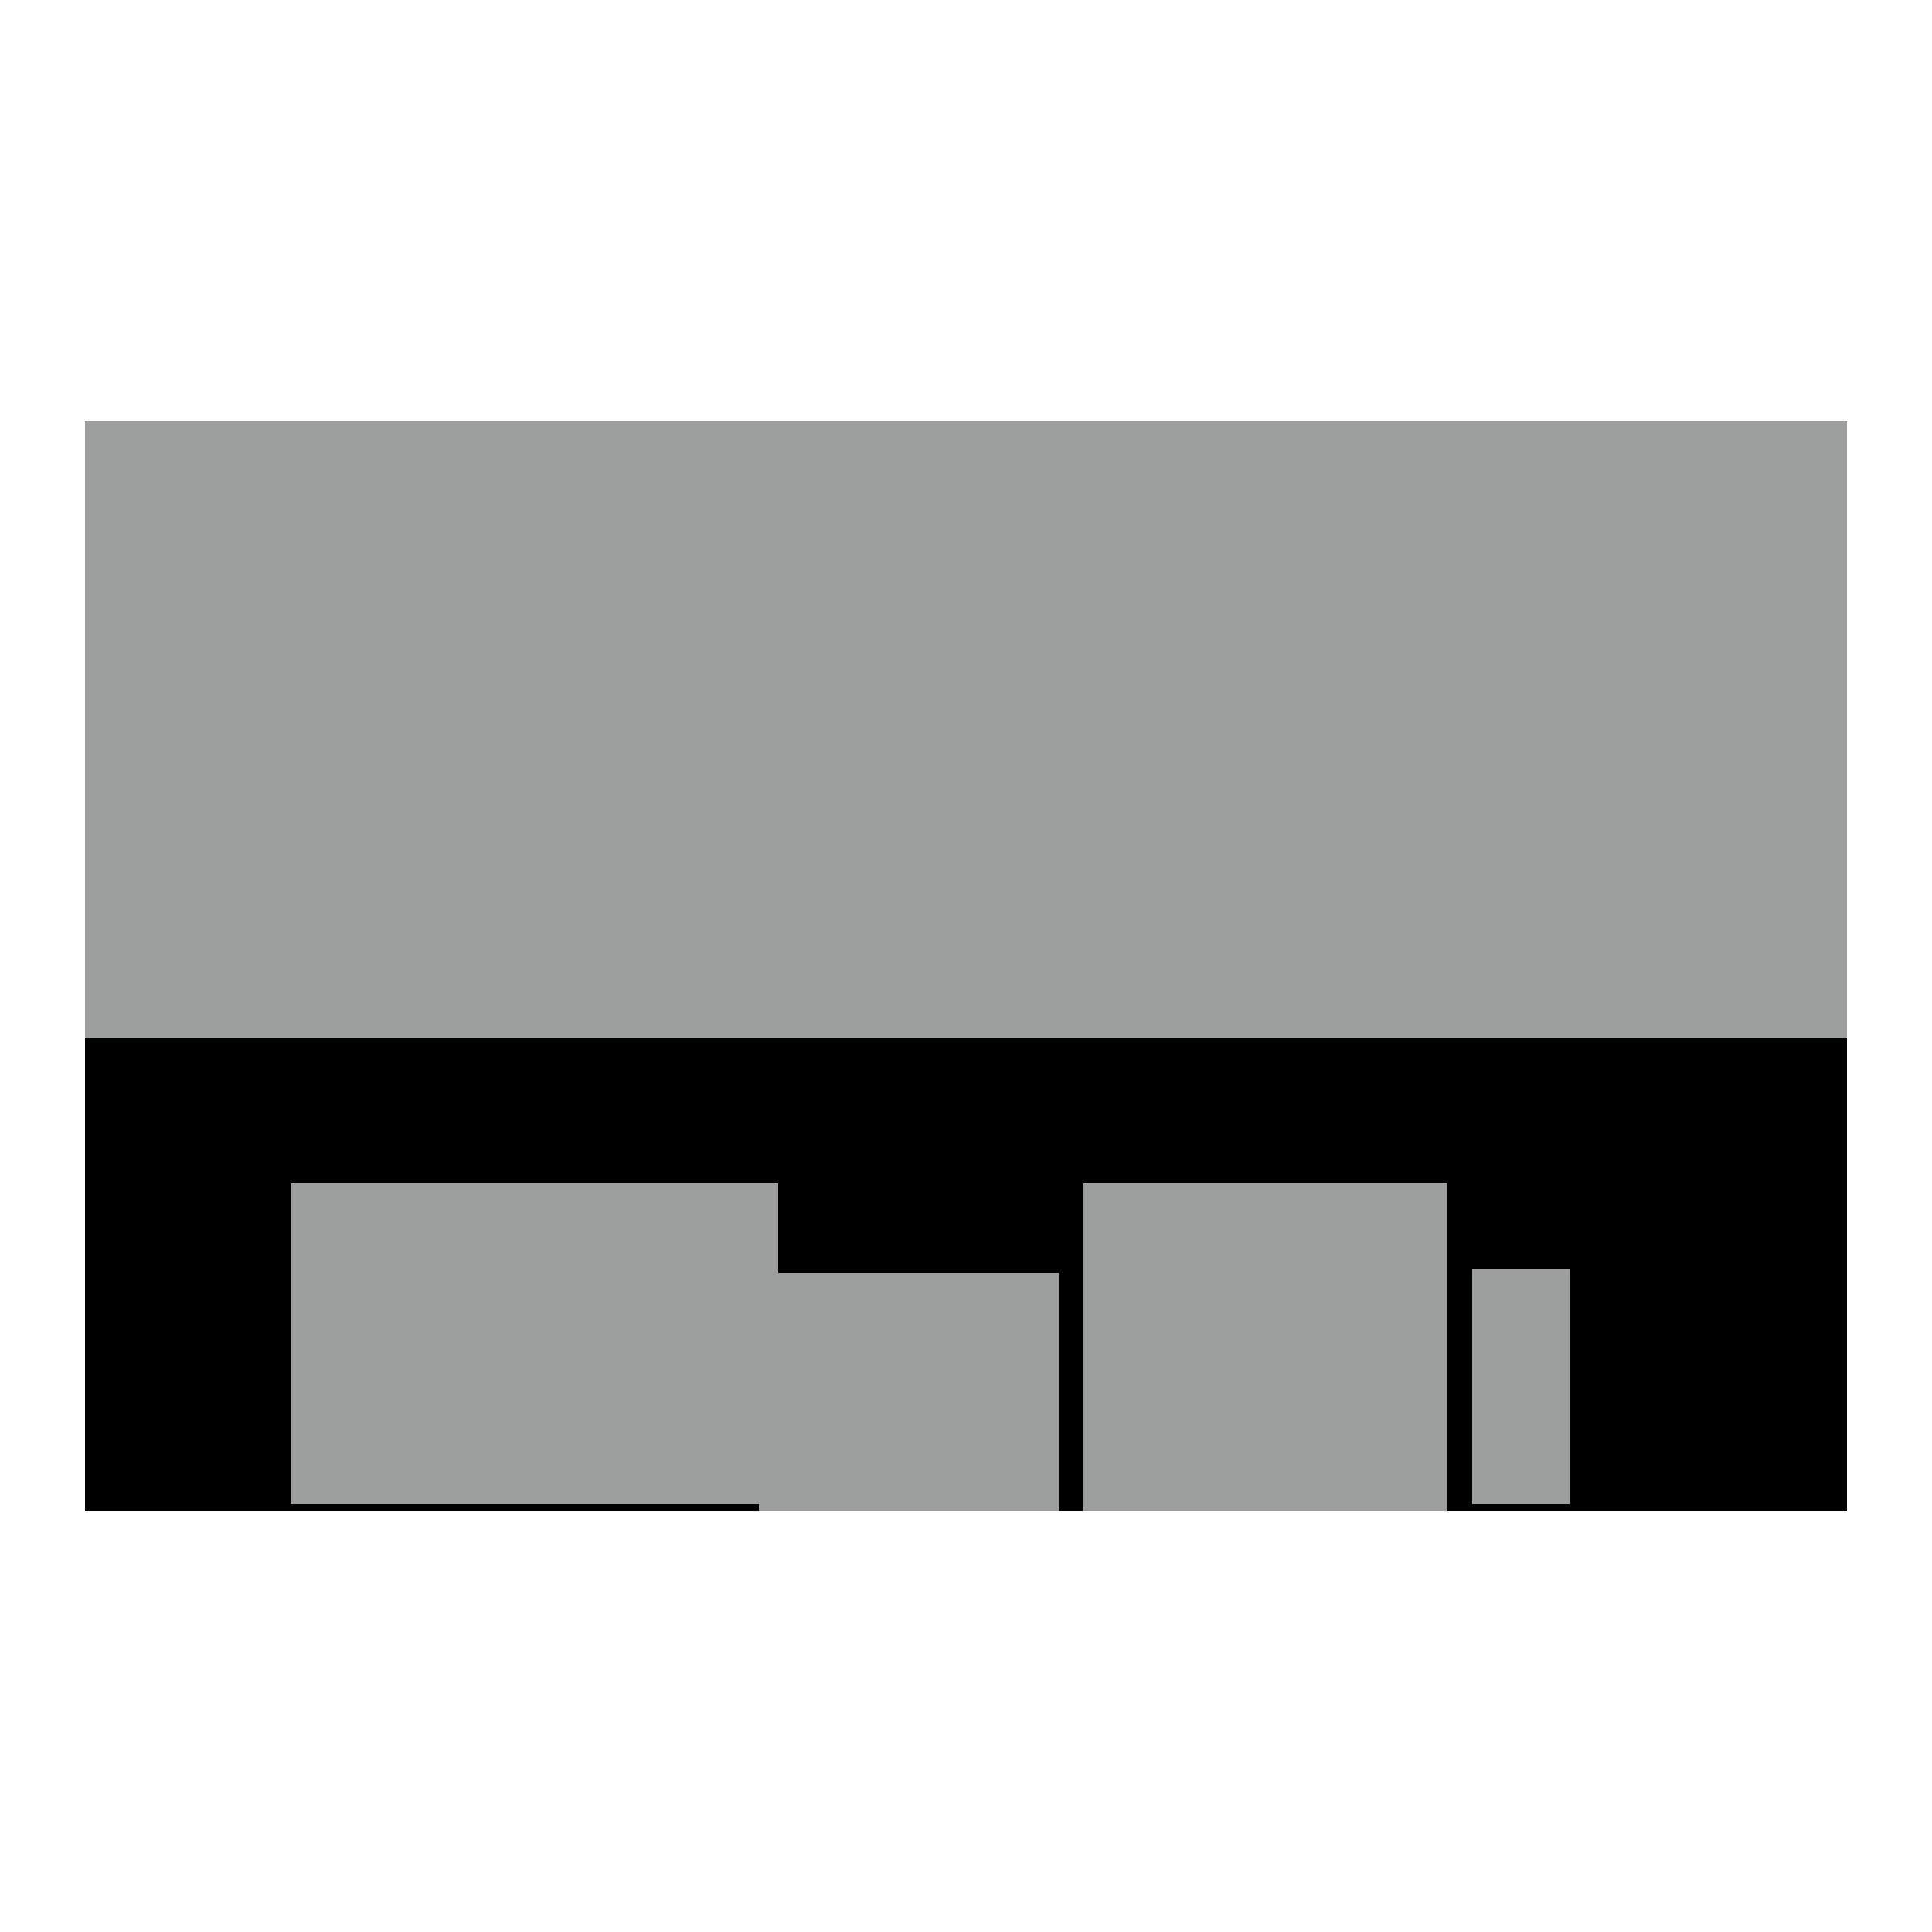 audi-14-logo-png-transparent copy.png